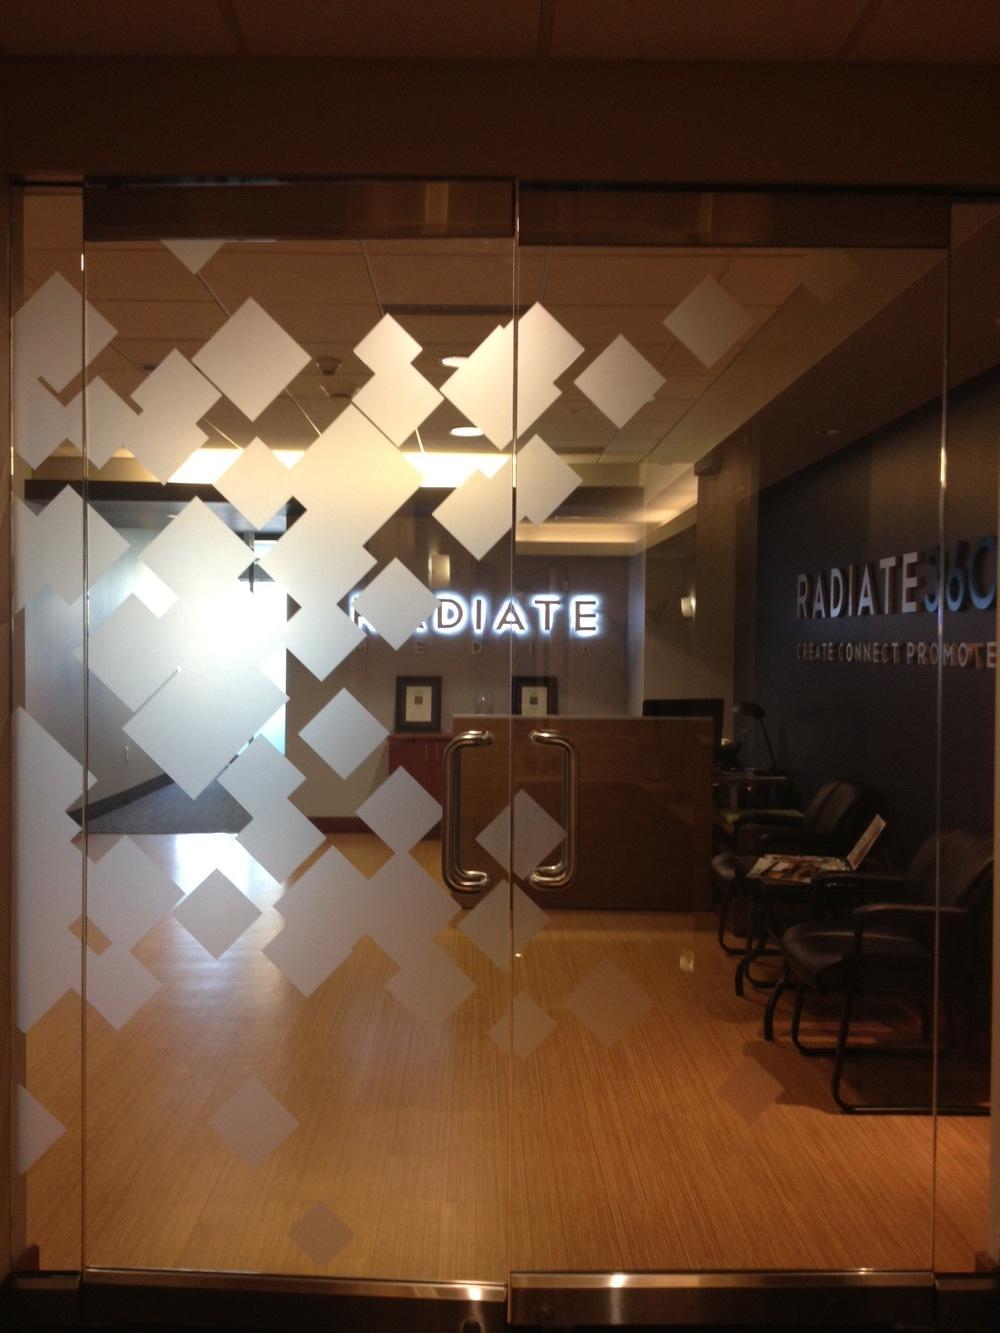 Main Entryway Door Decal, Radiate Media Office, Salt Lake City, UT